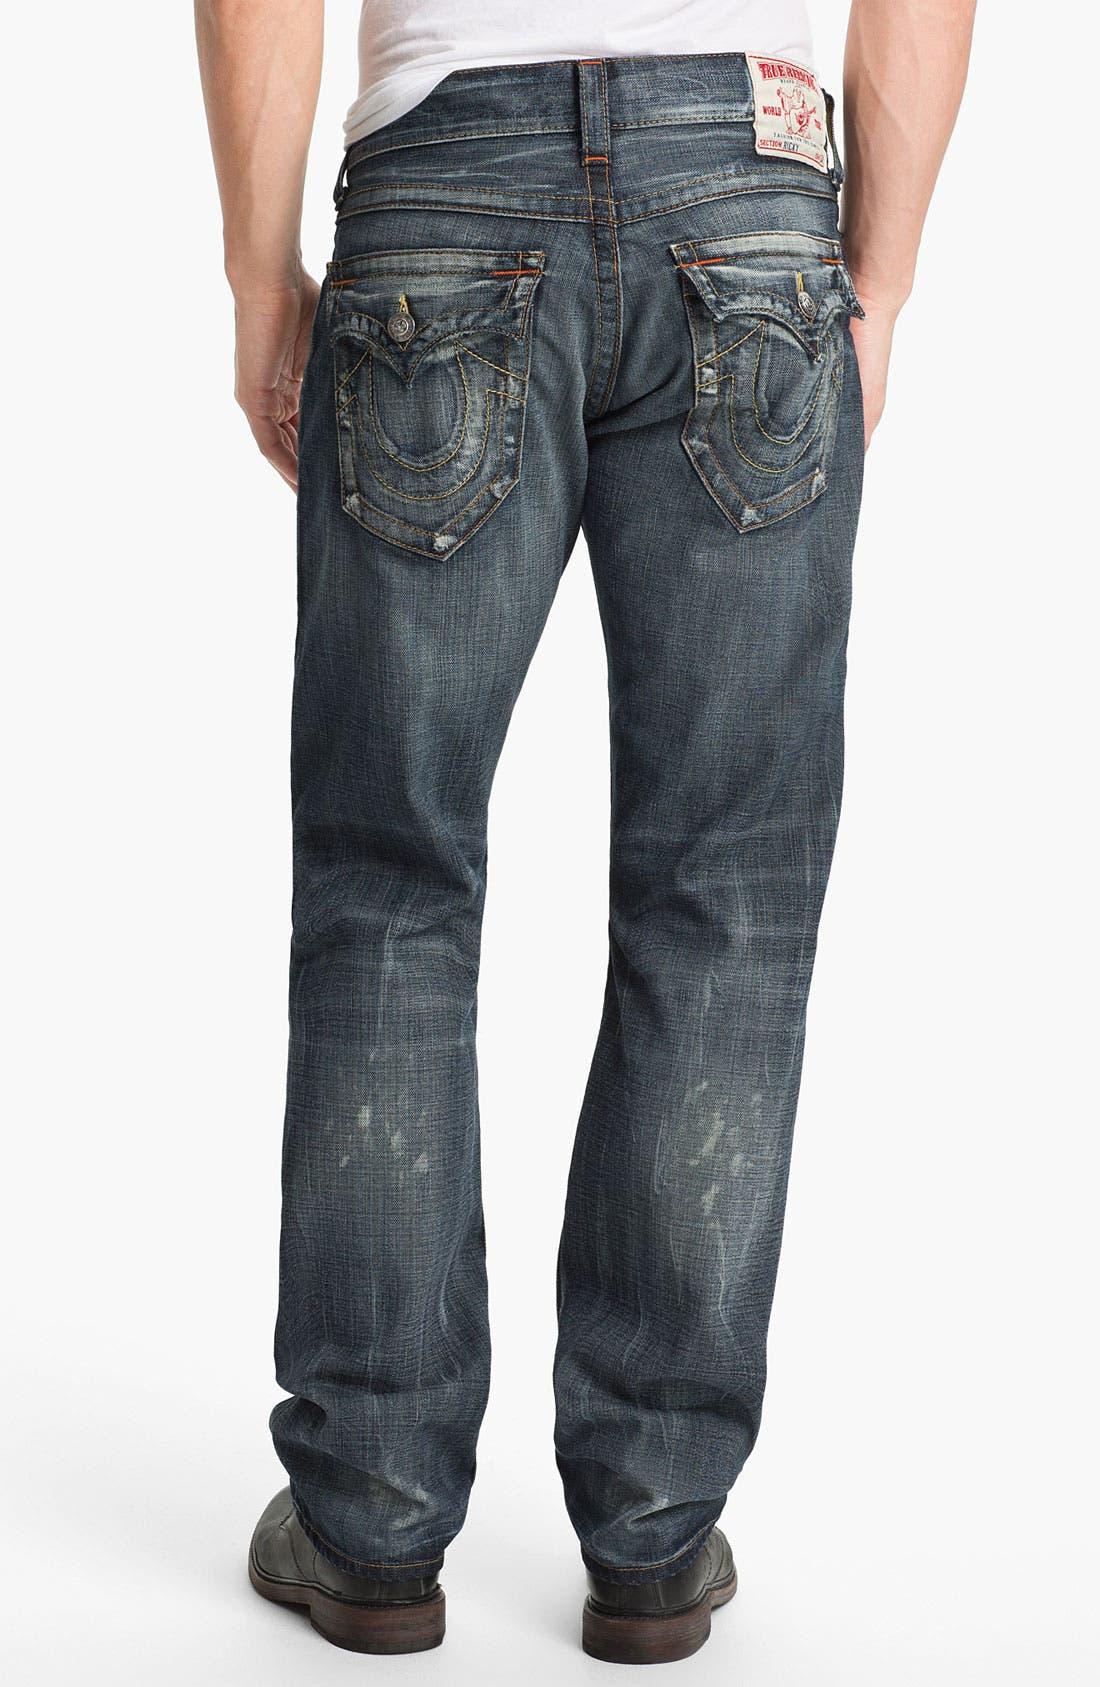 Main Image - True Religion Brand Jeans 'Ricky' Straight Leg Jeans (Granite)